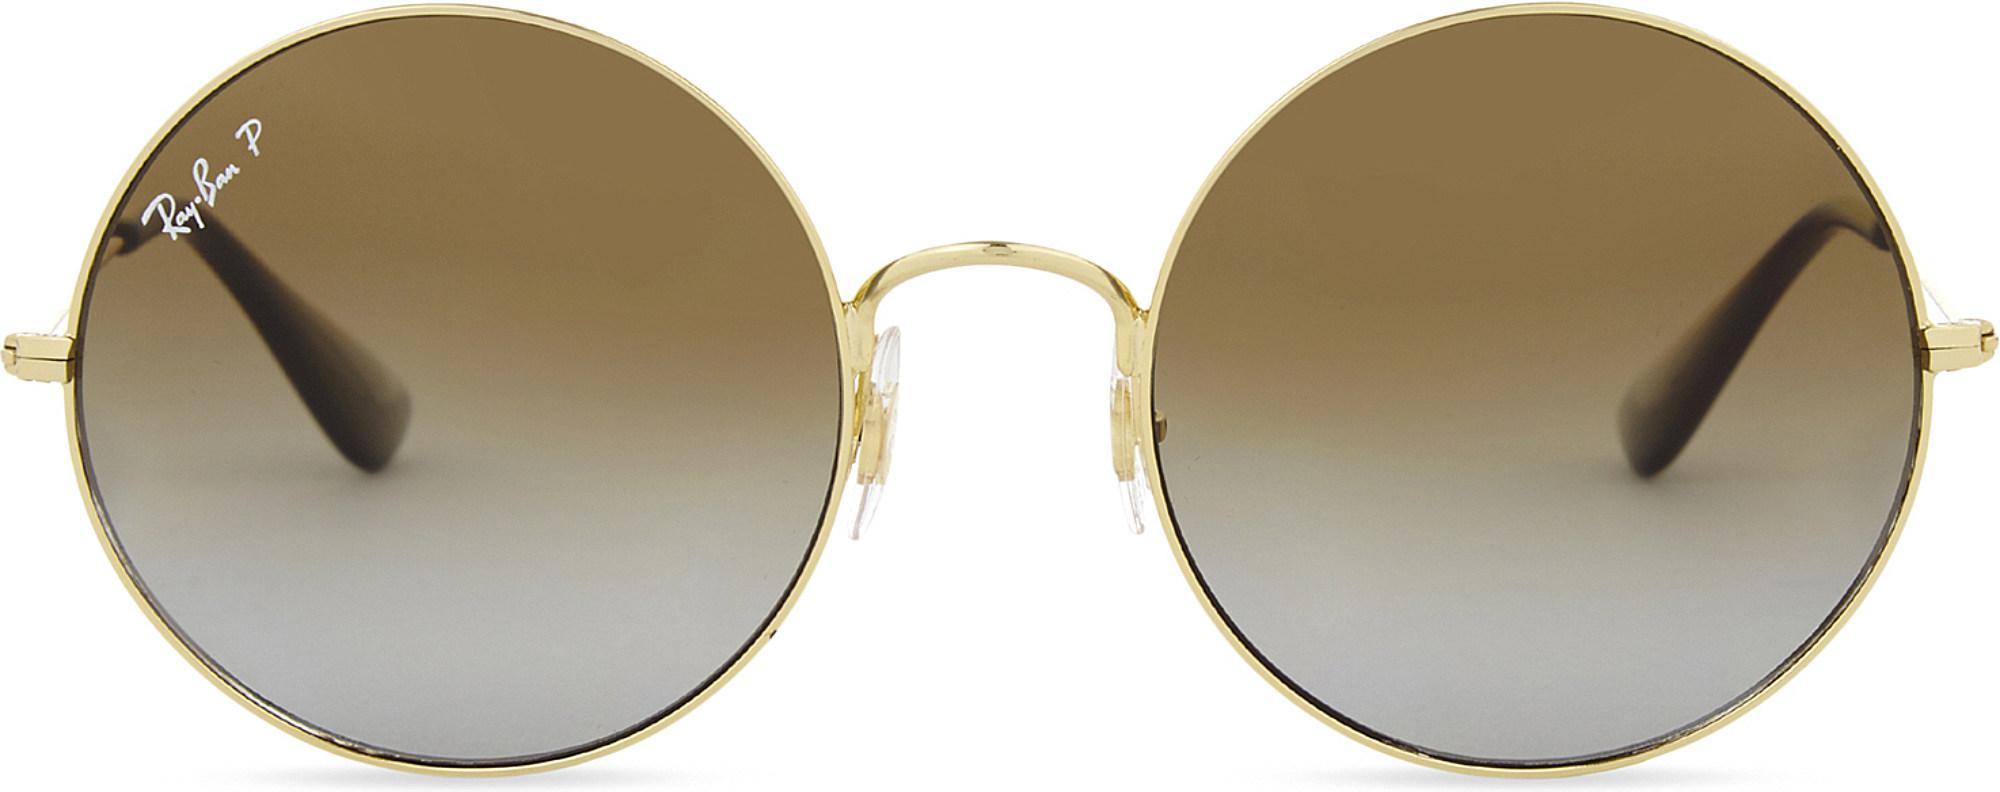 e123a83e22 Lyst - Ray-Ban Rb3592 Ja-jo Round-frame Sunglasses in Metallic